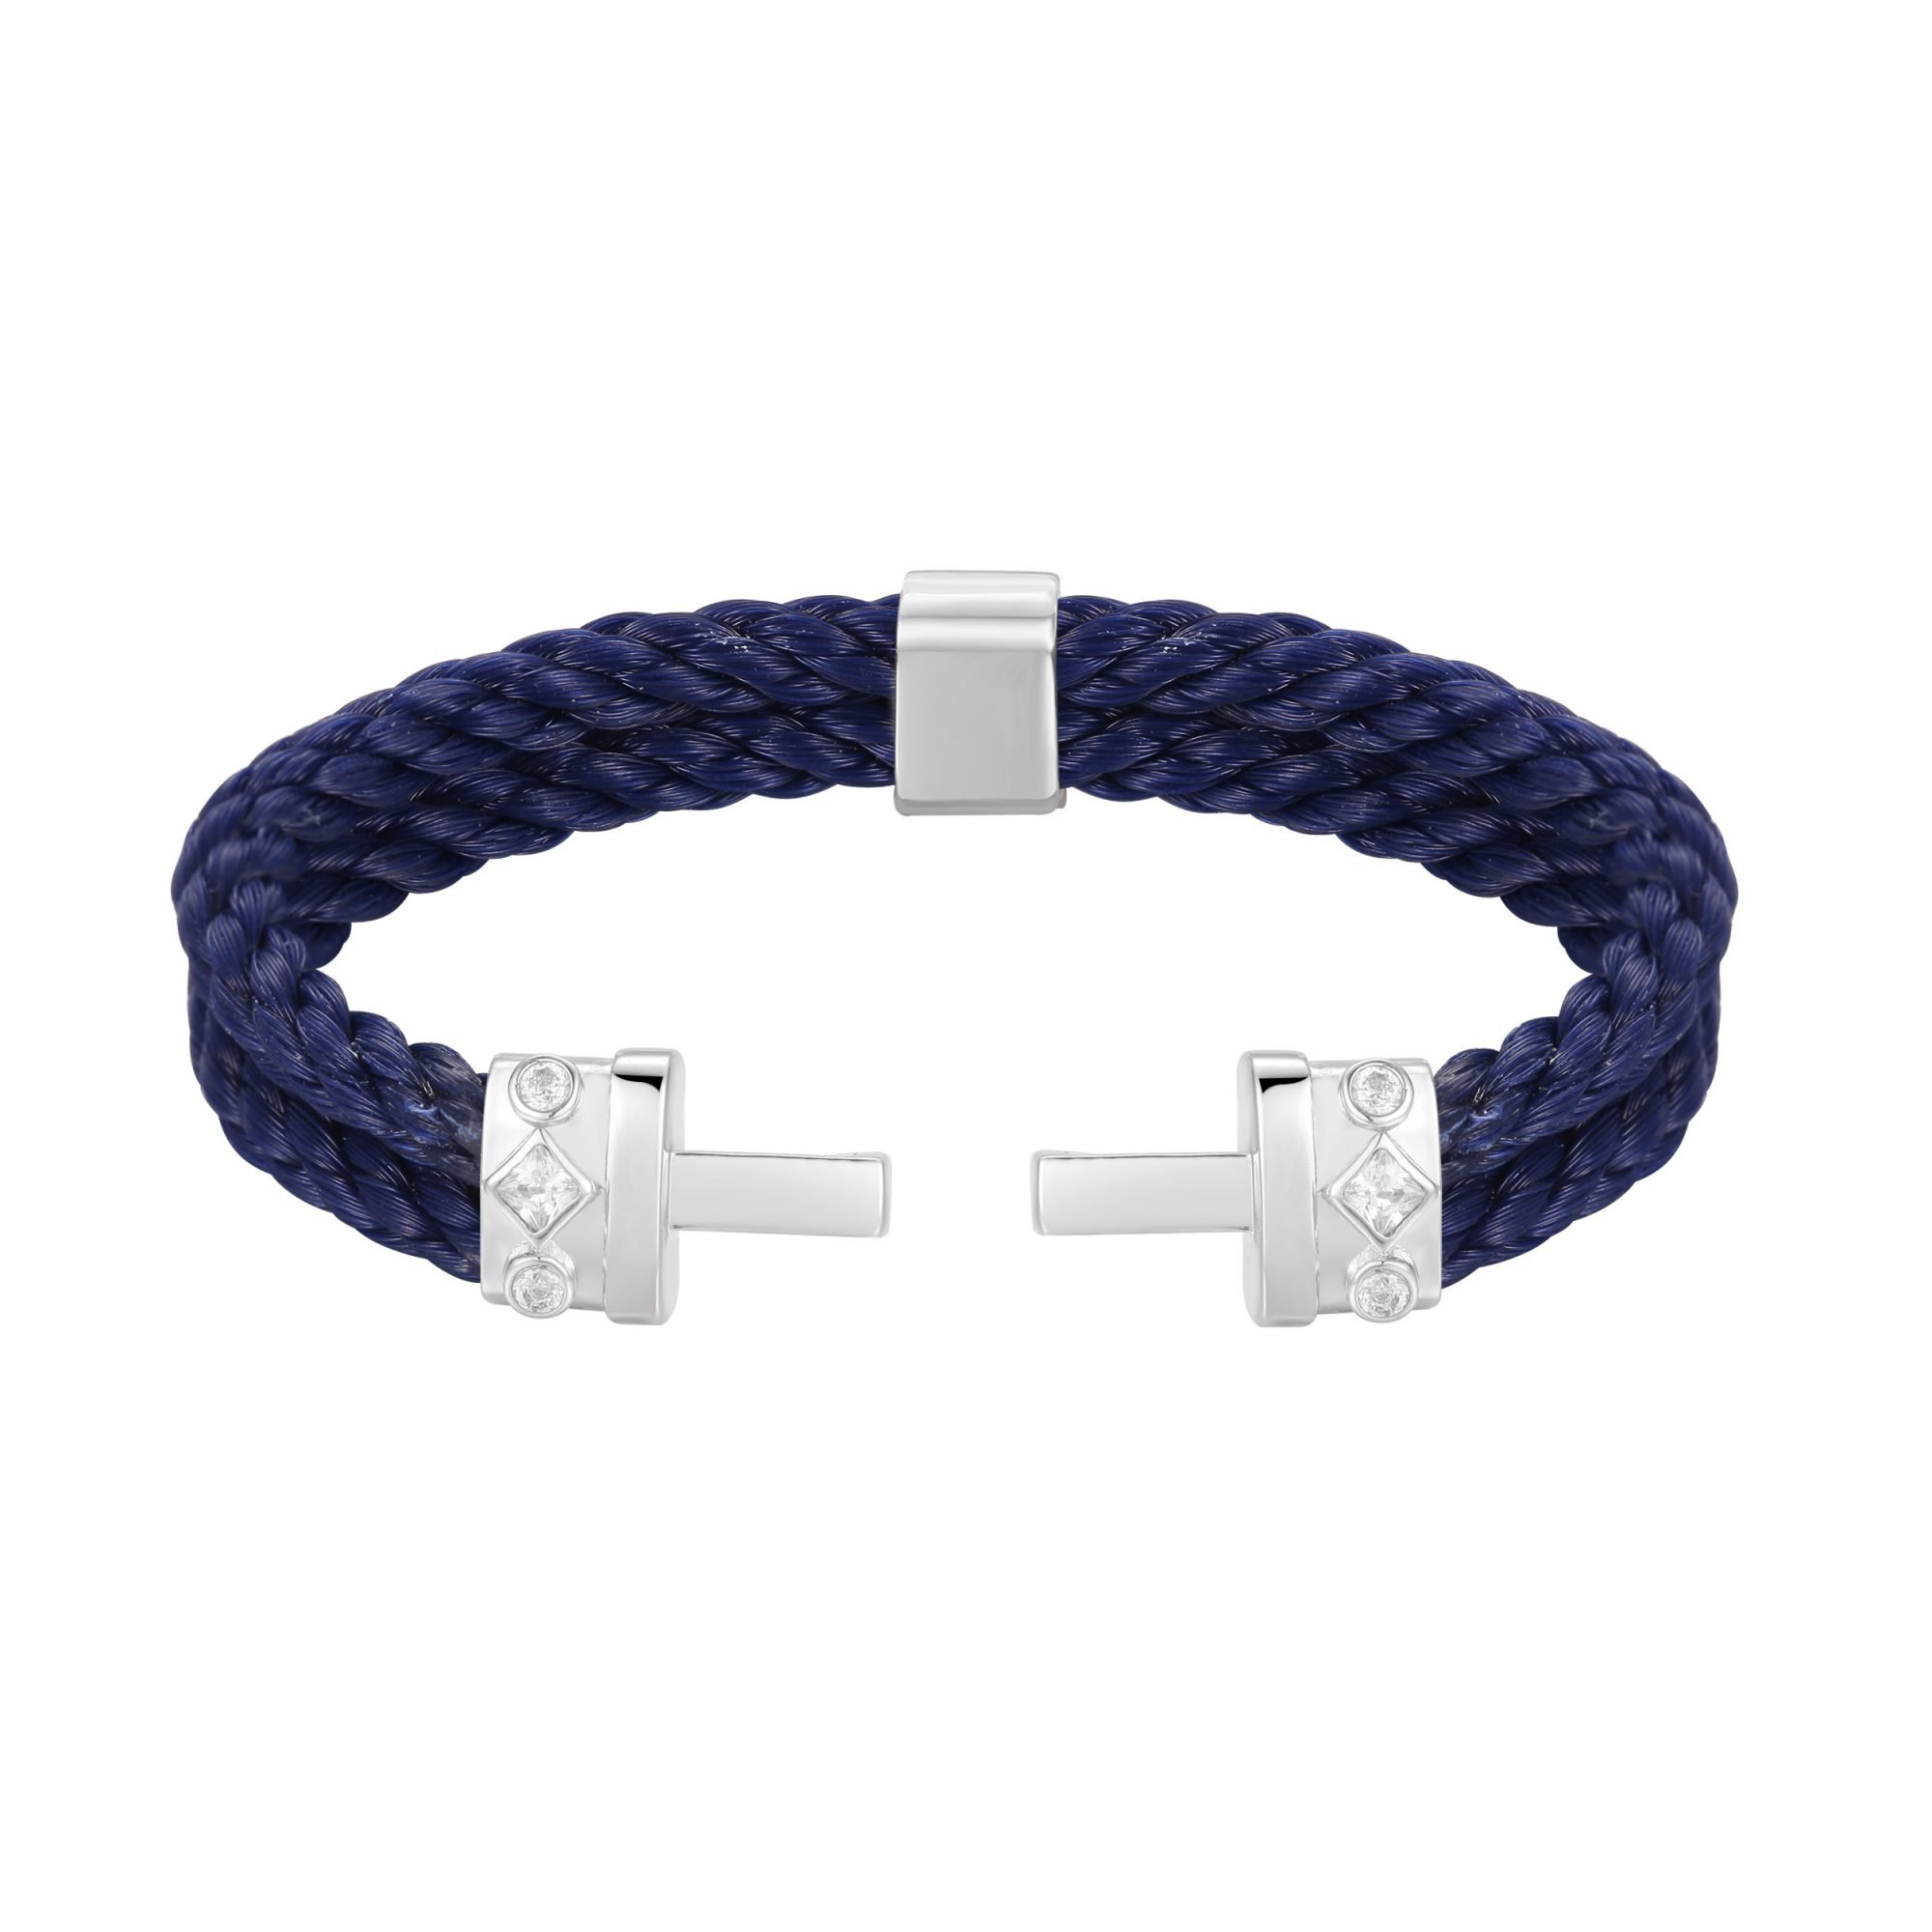 VIKTOR ALEXANDER 925 SILVER B2 DOUBLE LOCK BRACELET NATURAL WHITE SAPPHIRE SILICON NYLON ROPE NAVY BLUE MAIN PROFILE